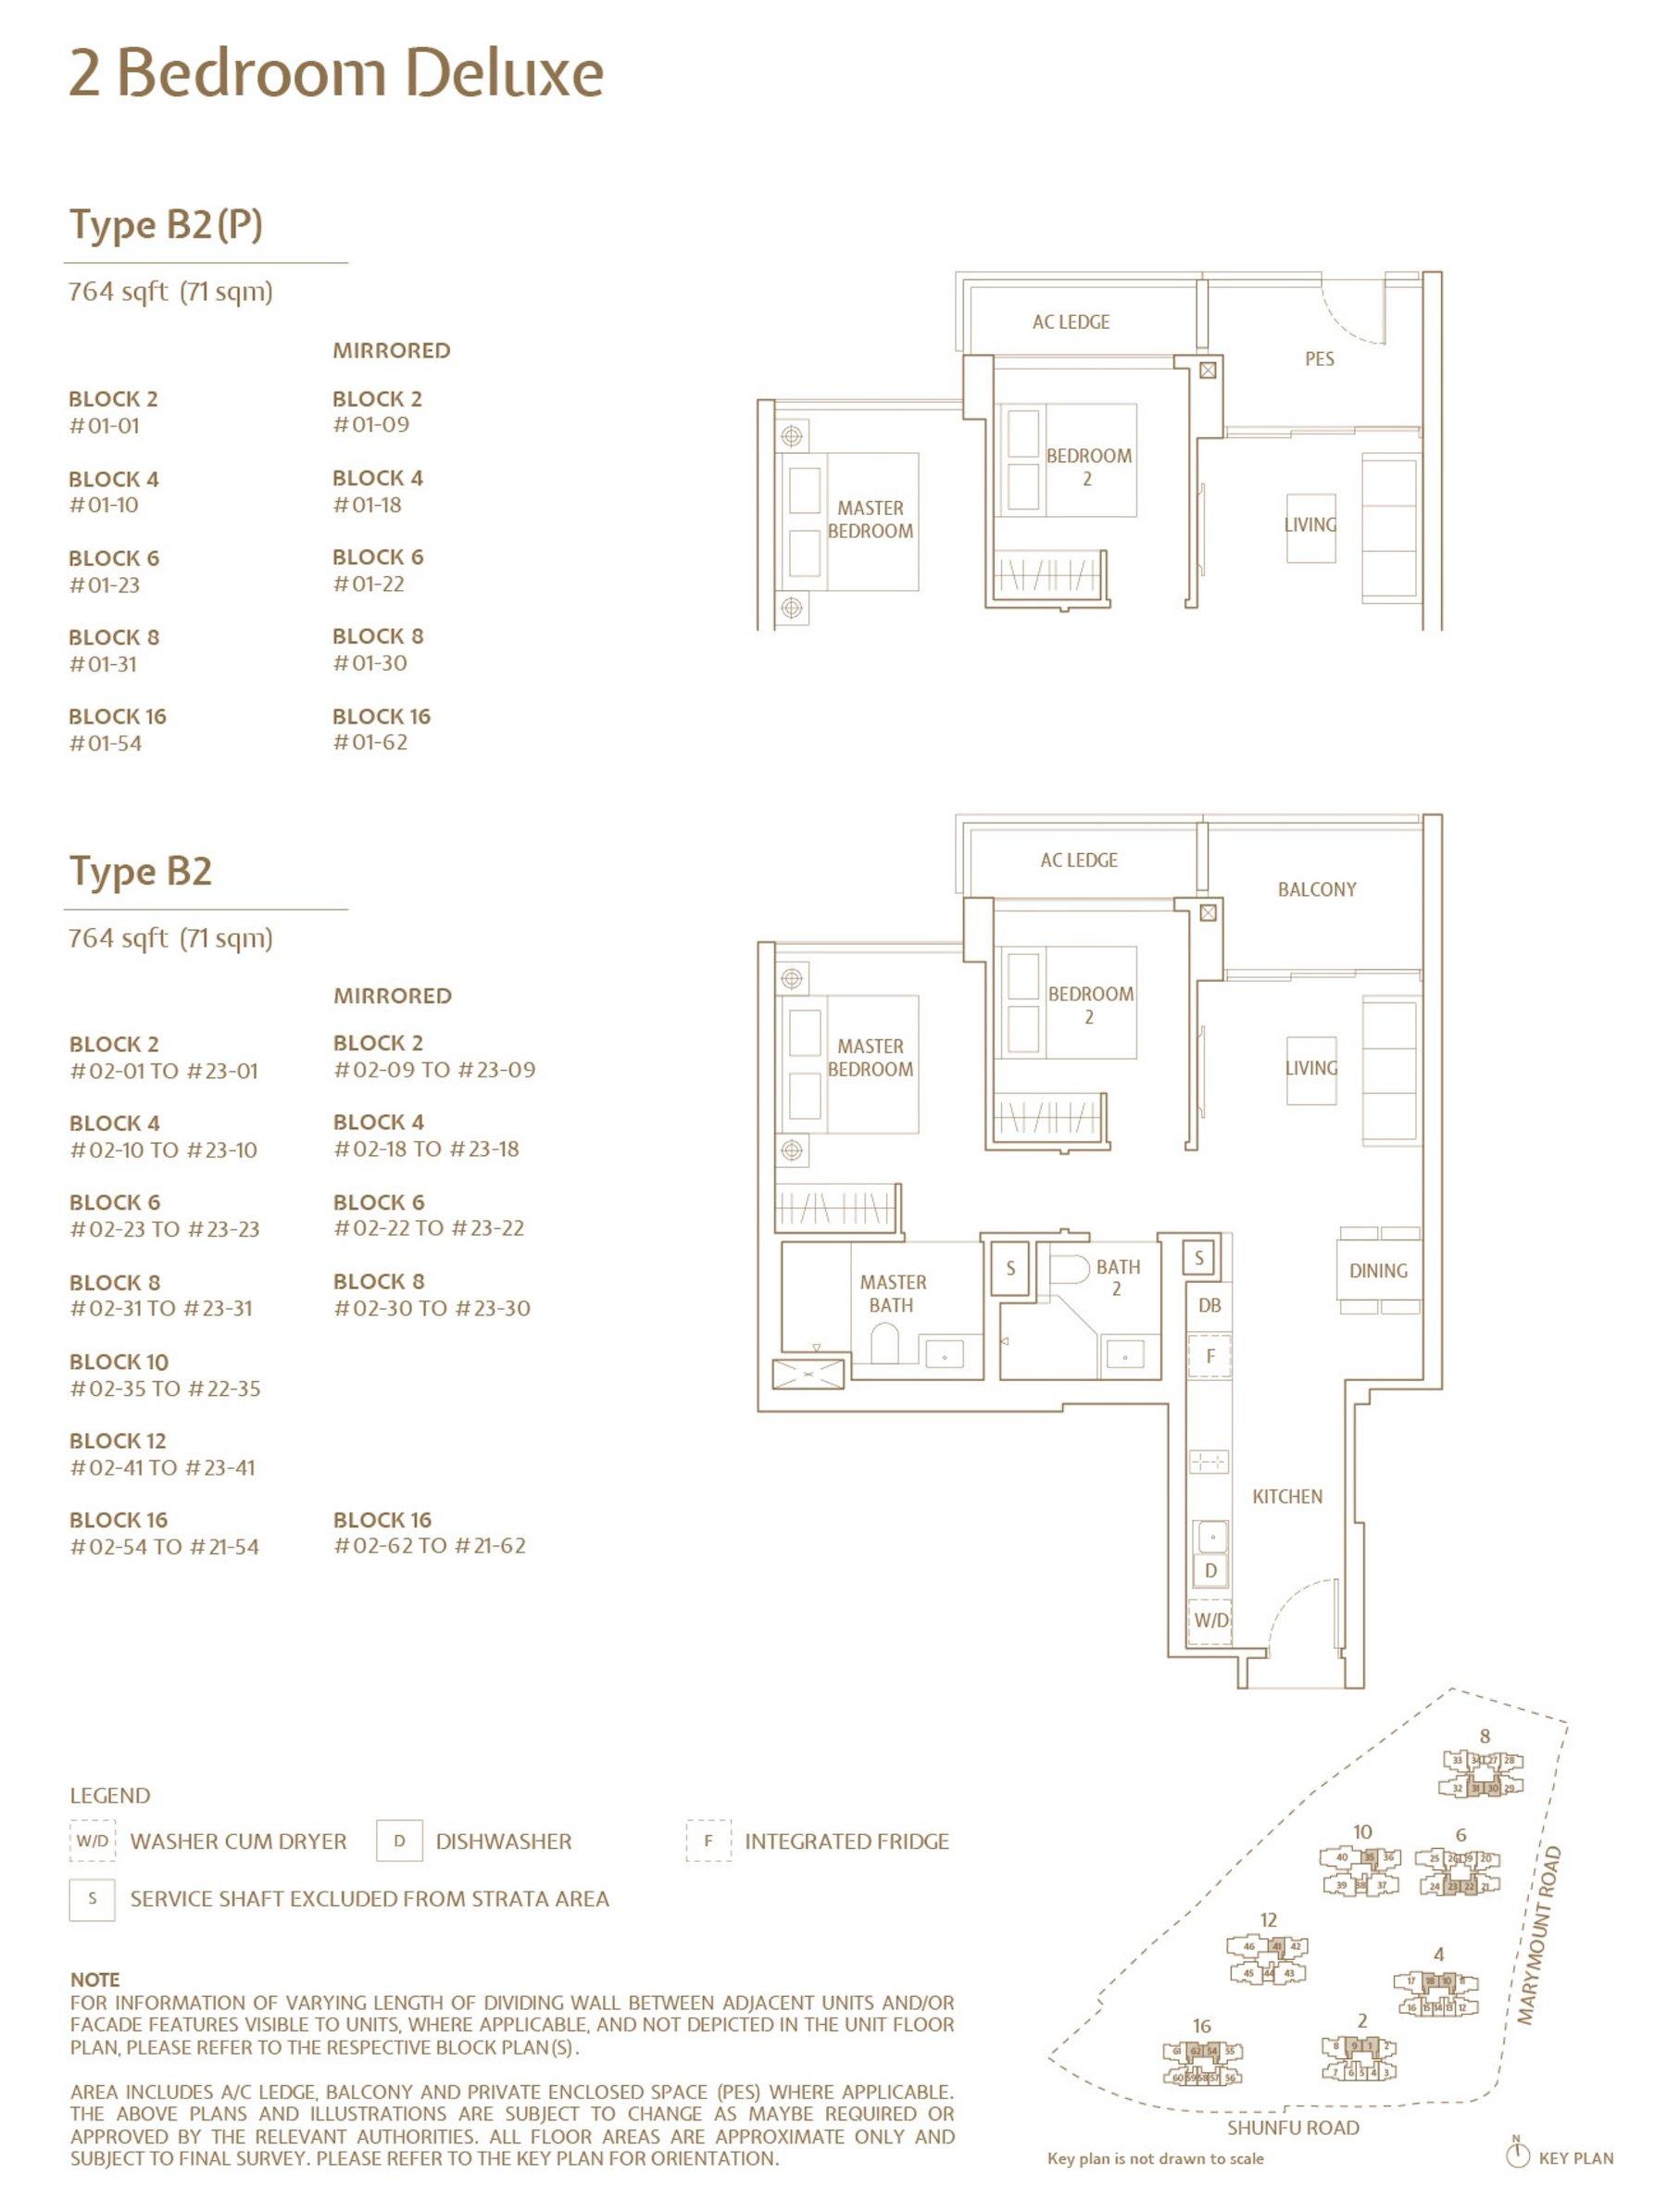 Jadescape 顺福轩 condo 2 bedroom type B2